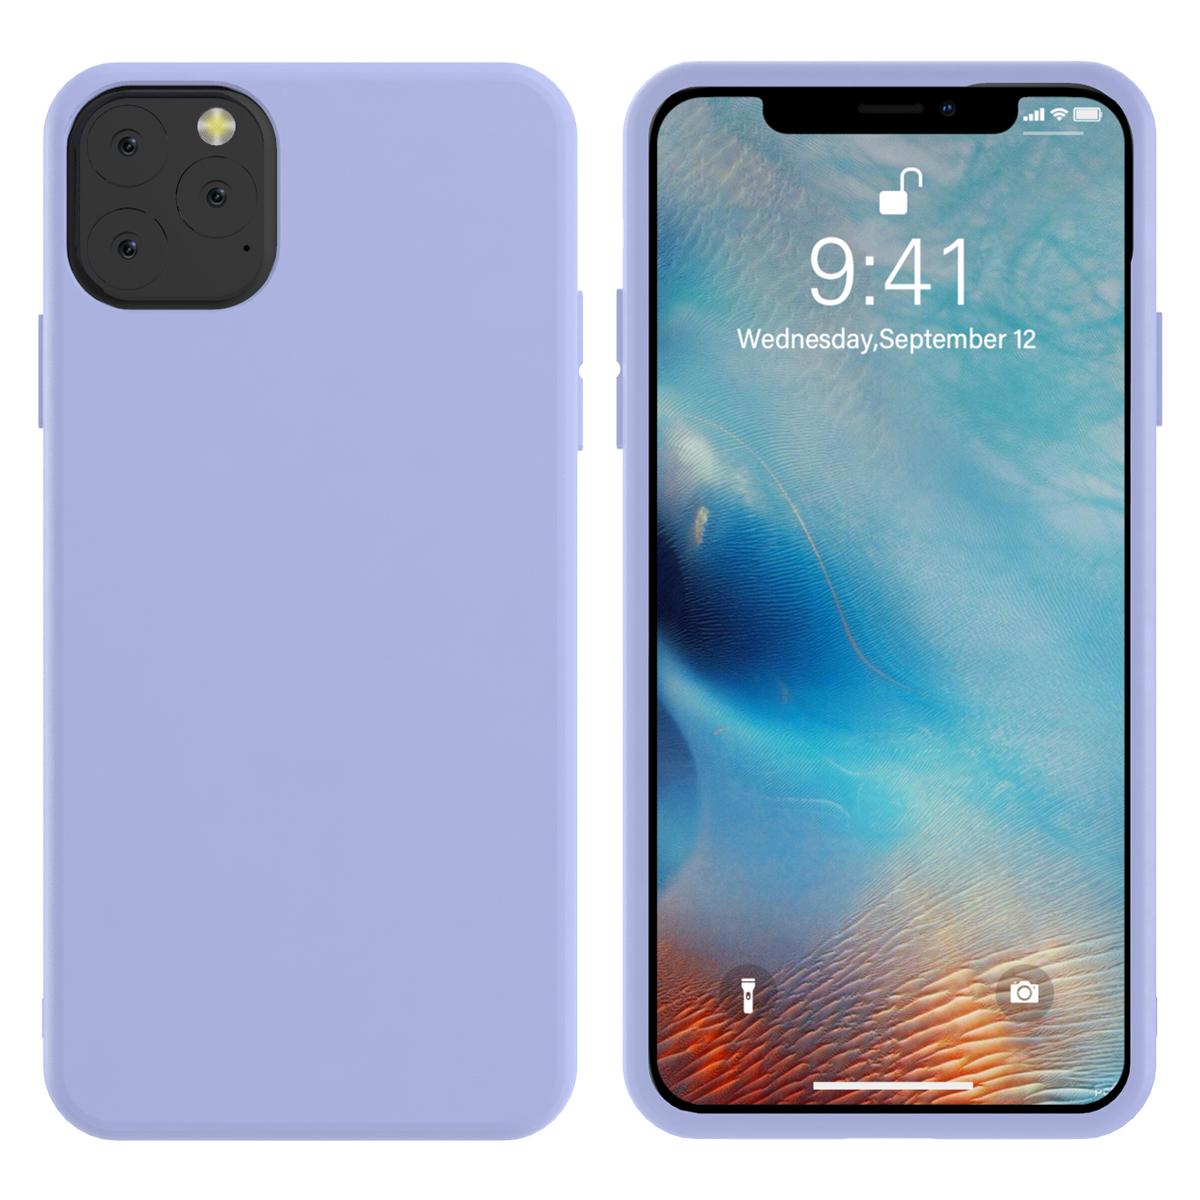 Torubia Silicone Case for iPhone 11/11 Pro/11 Pro Max 119